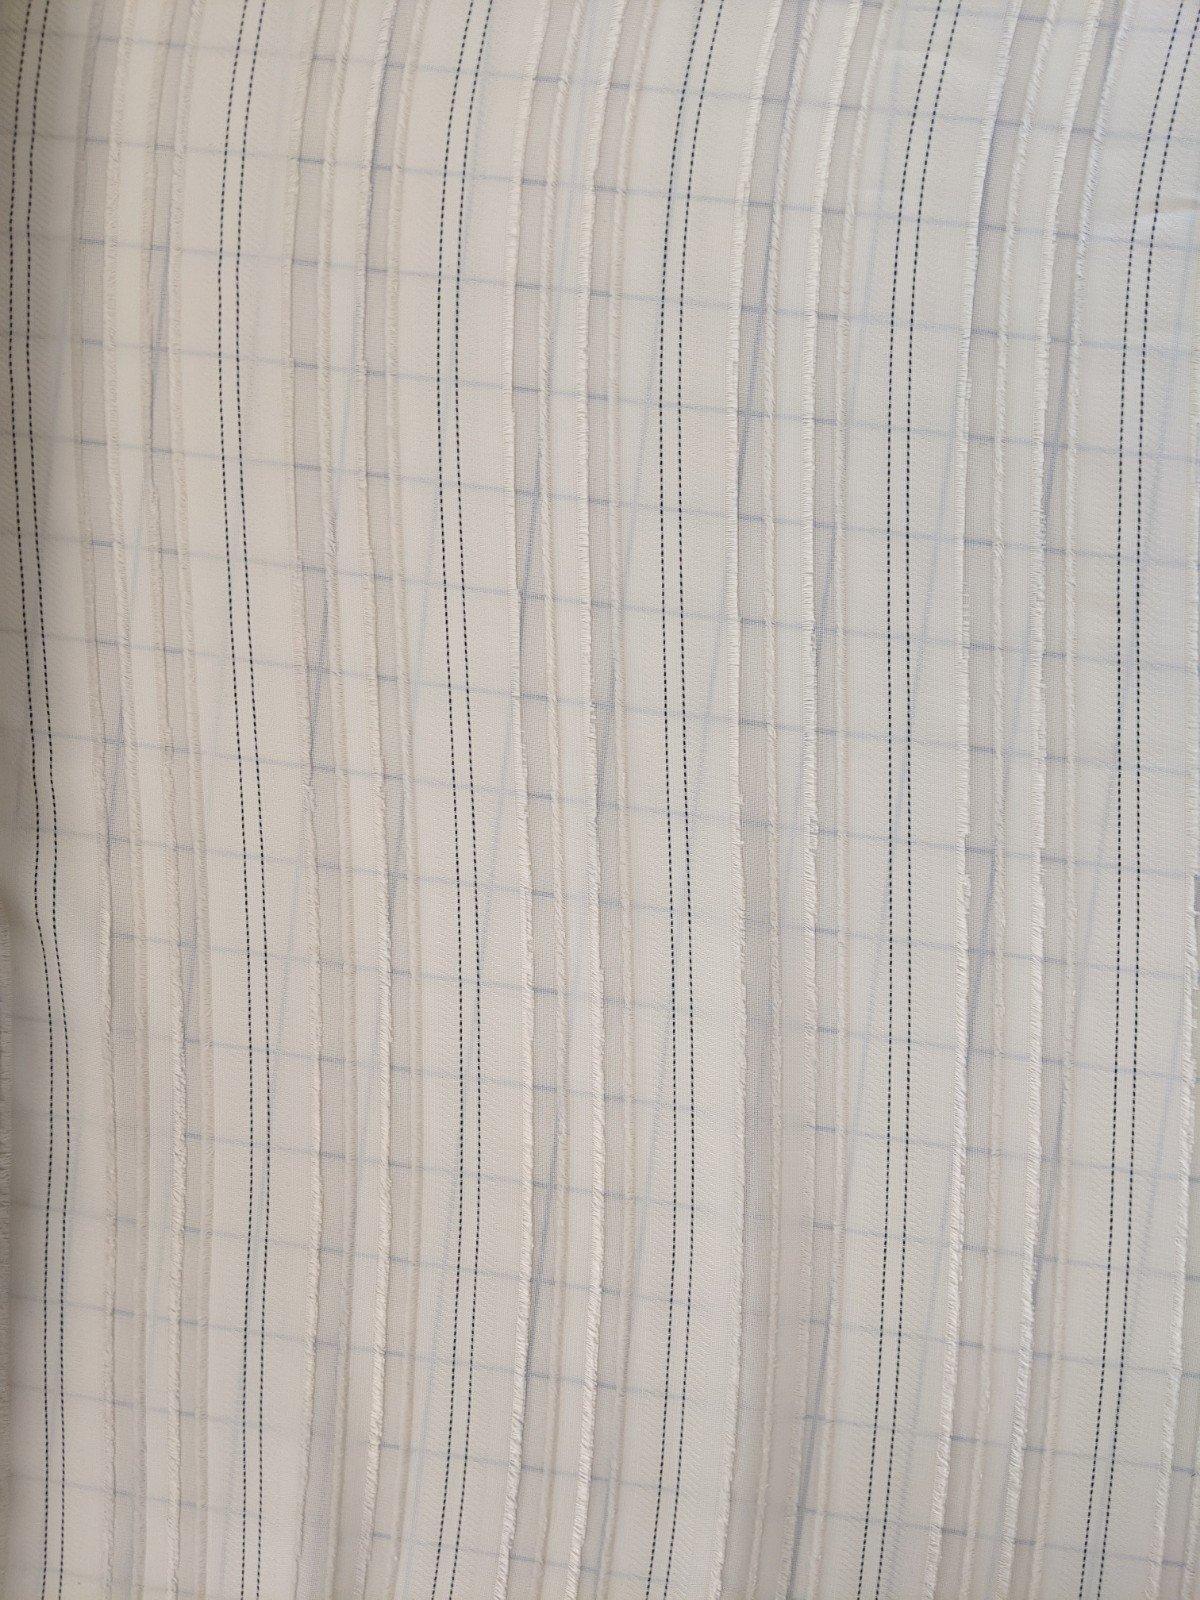 Polyester Textured Pinstripe